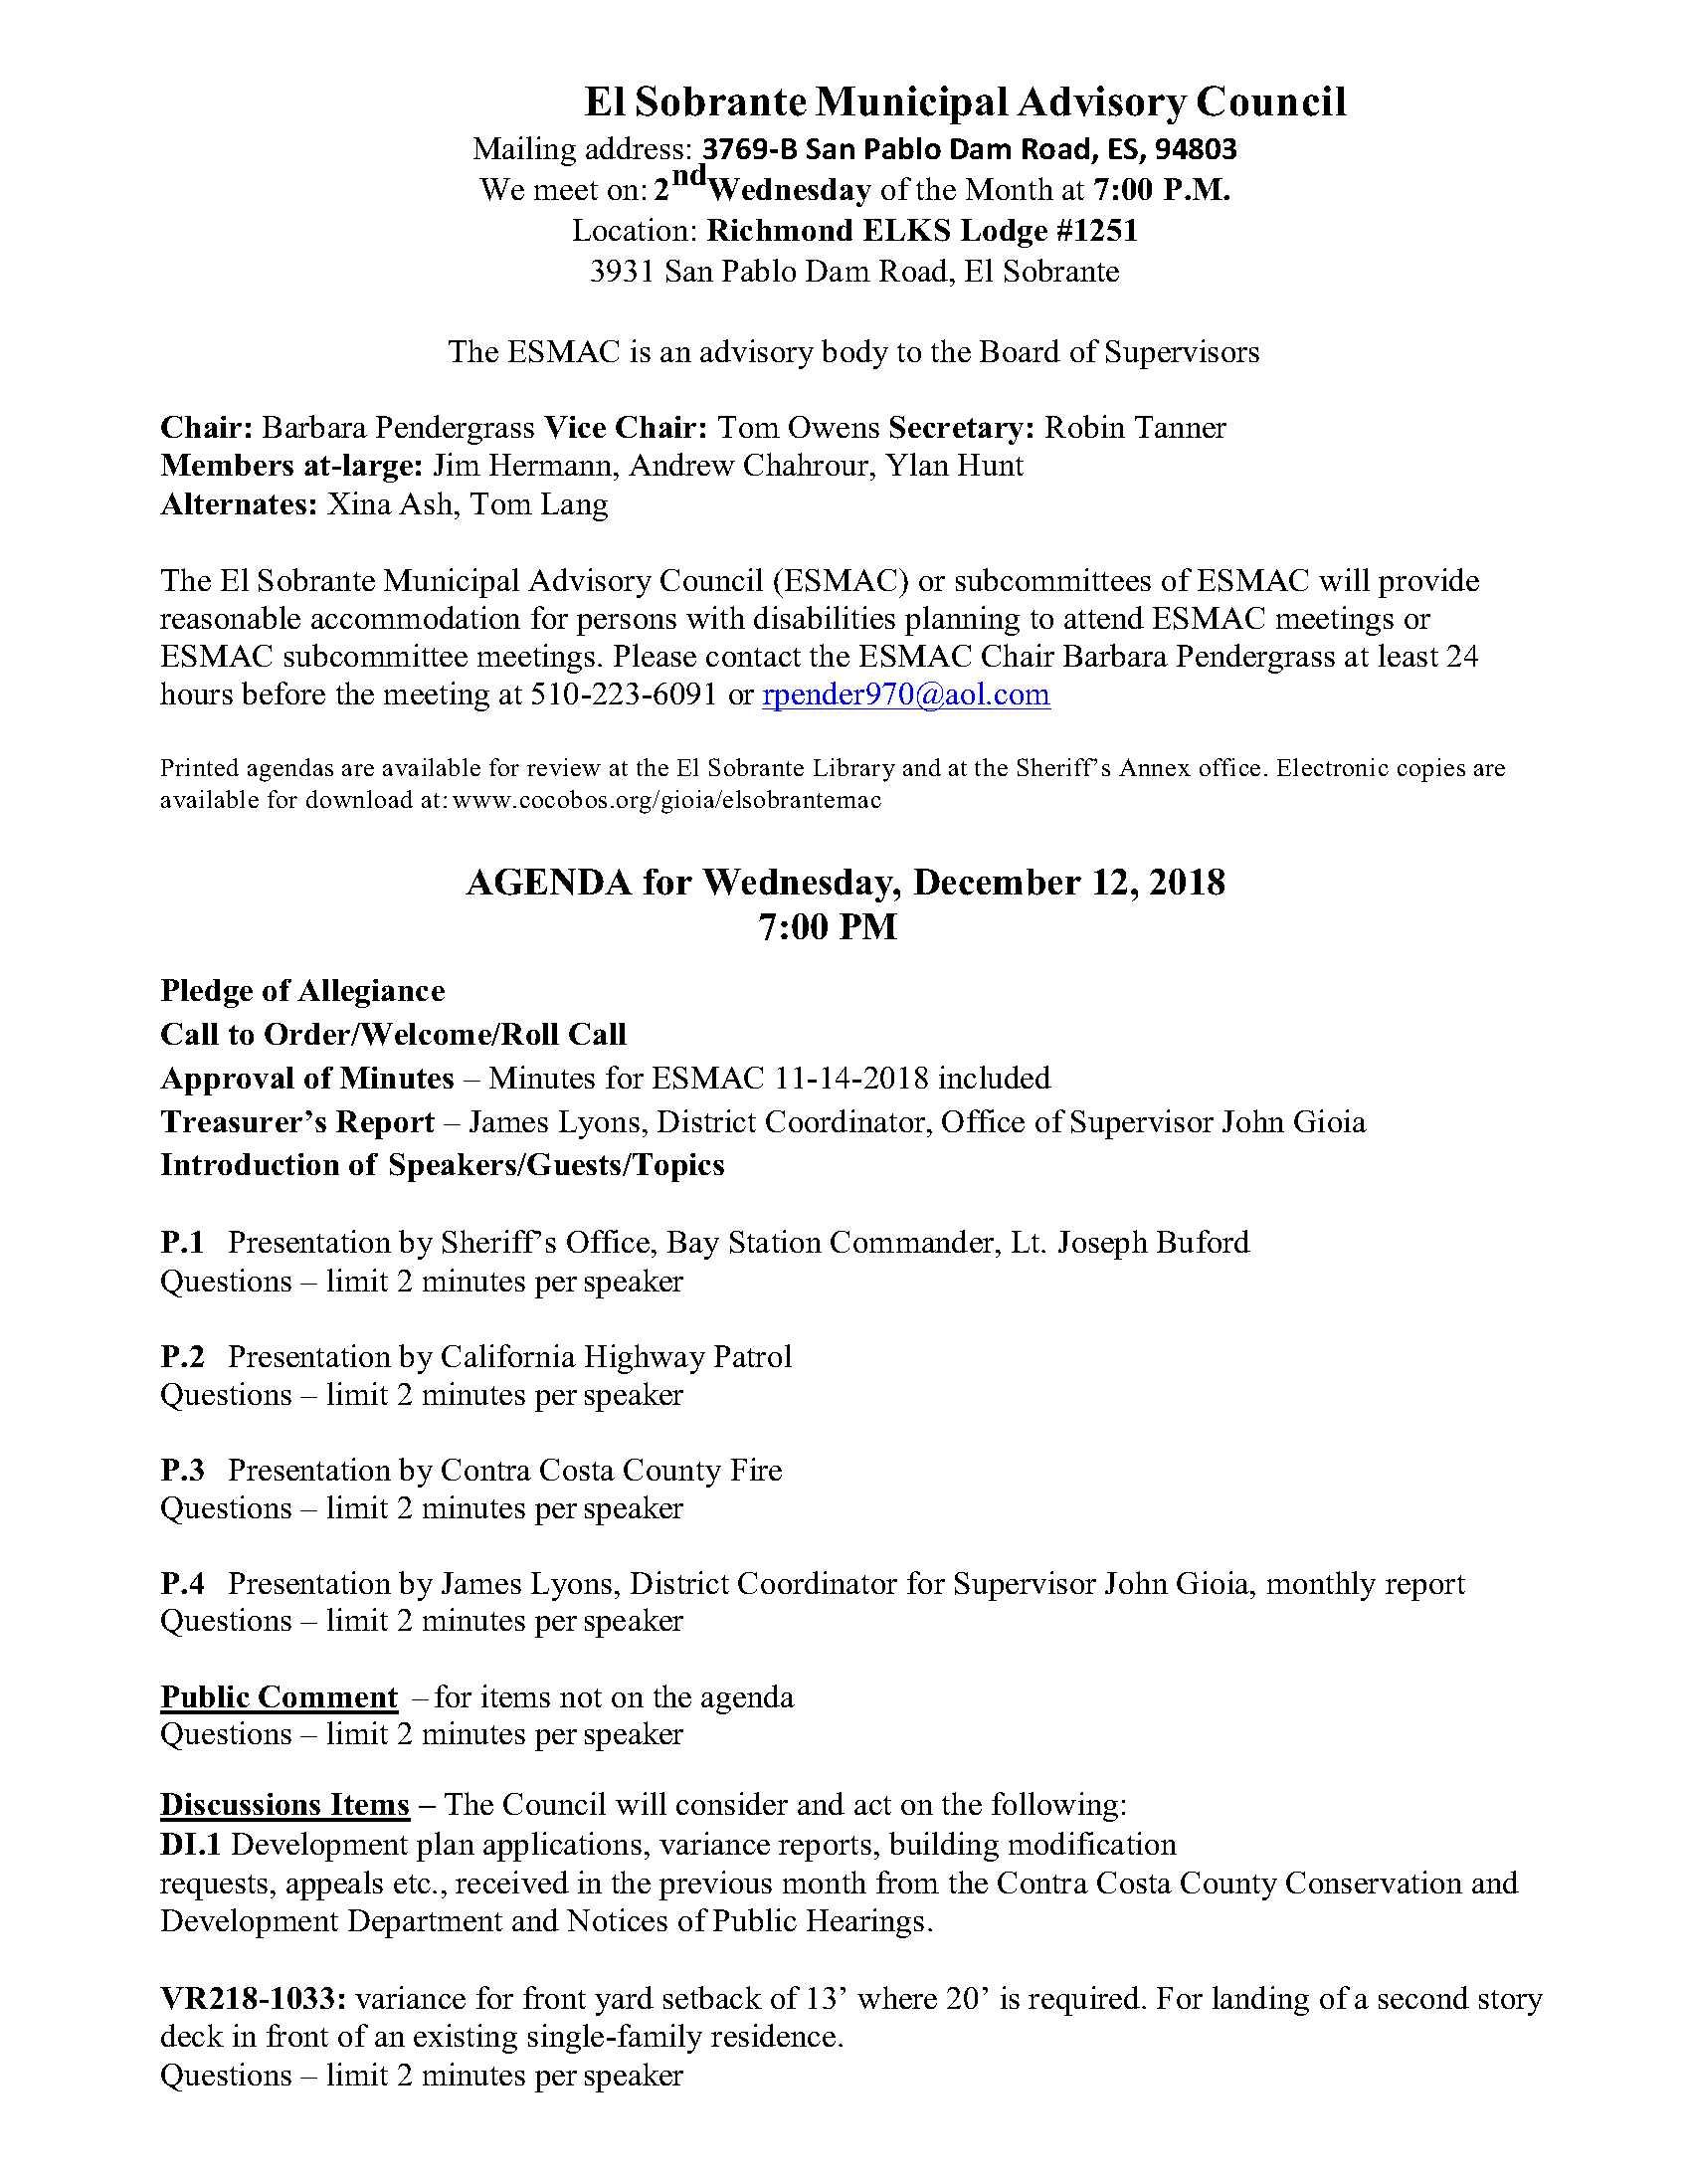 ESMAC Agenda 12.13.2018 (51 Pages)_1.jpg